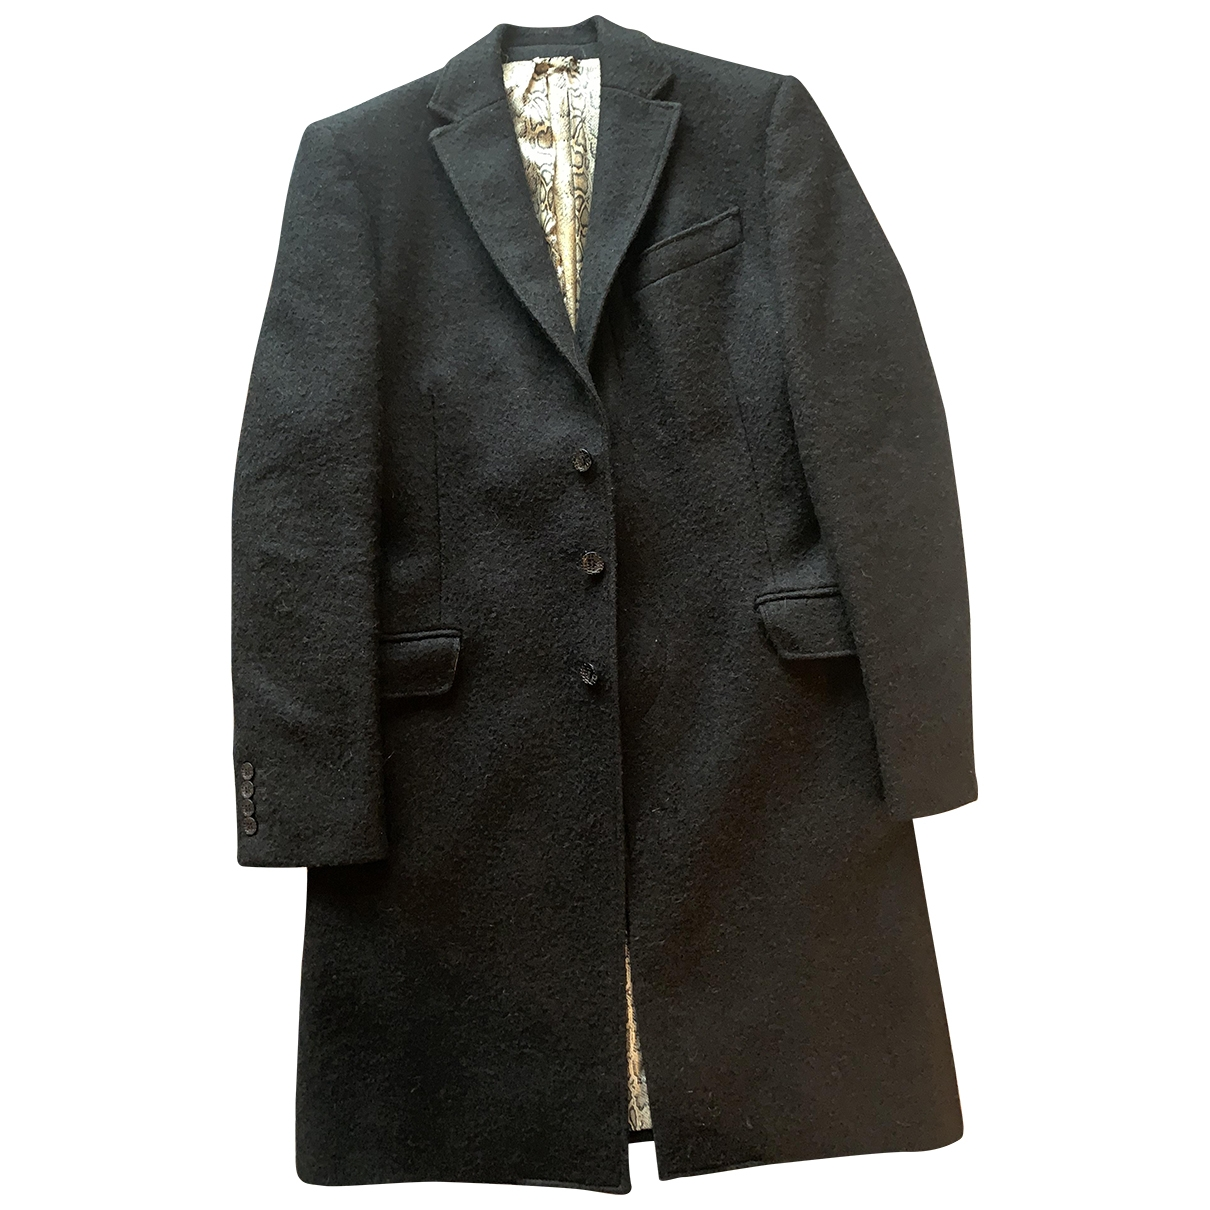 Just Cavalli \N Black Wool coat  for Men 46 IT